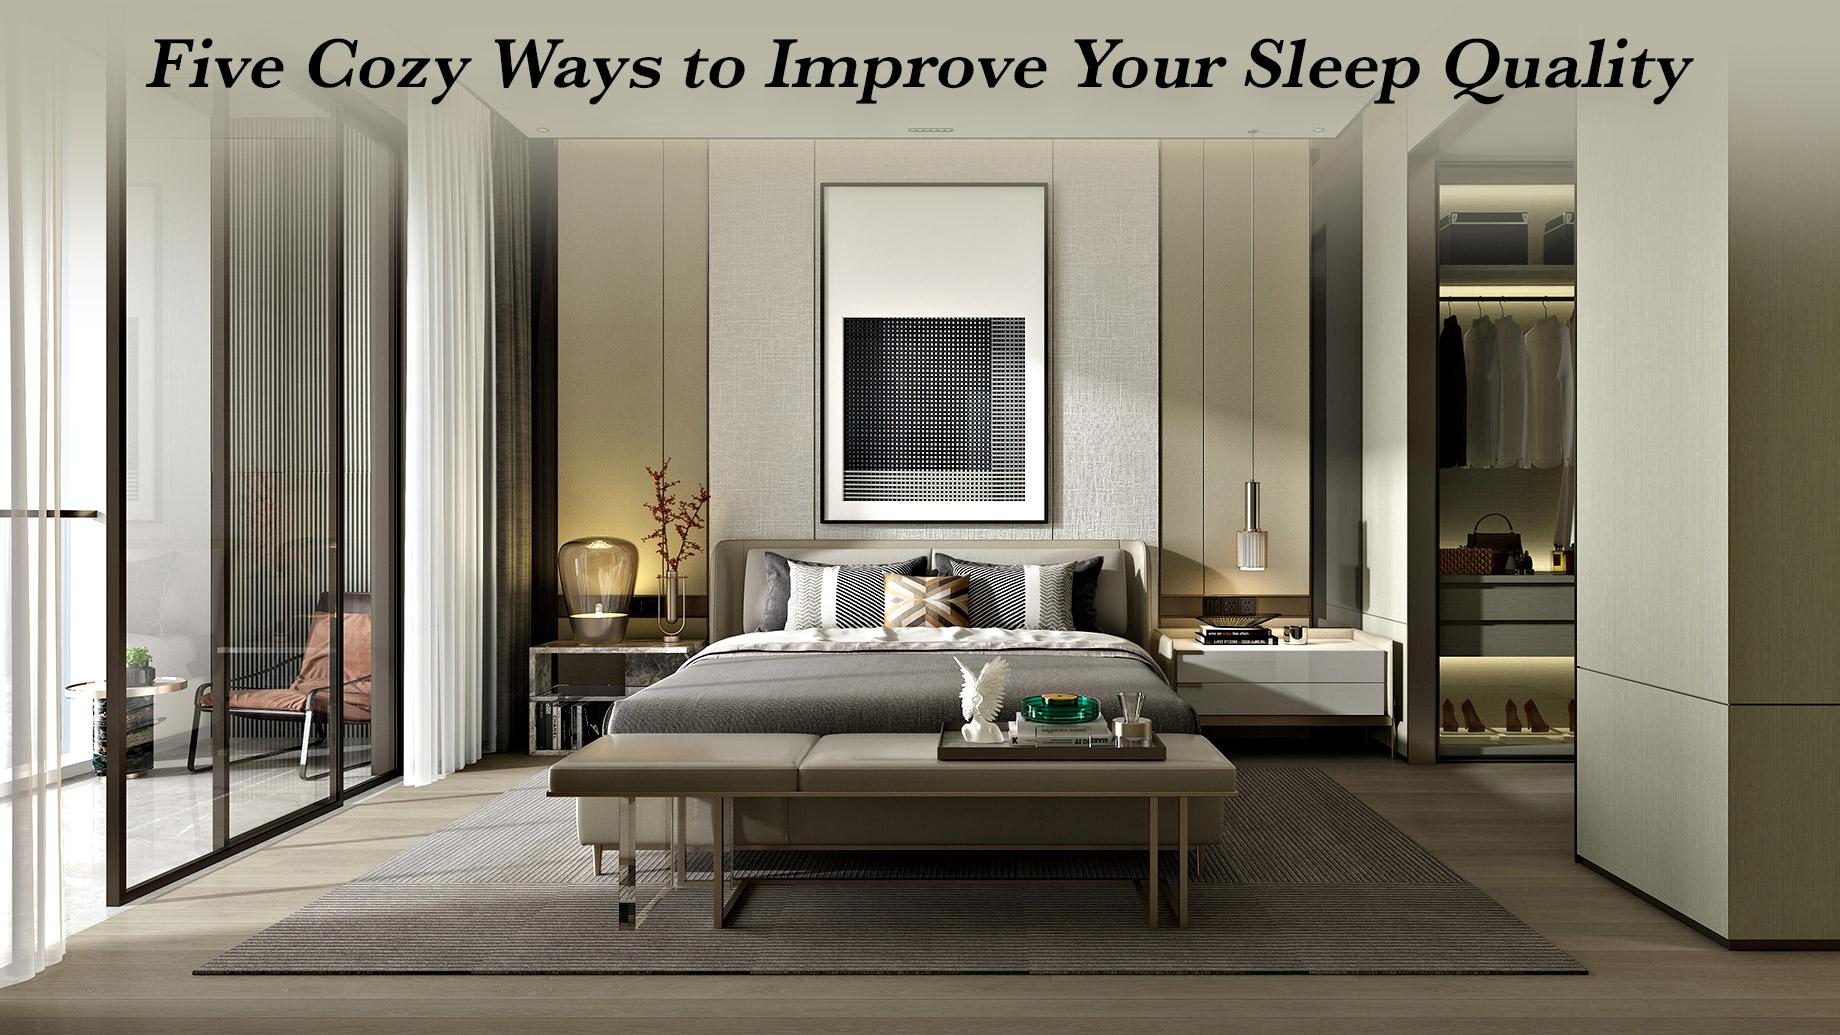 Five Cozy Ways to Improve Your Sleep Quality